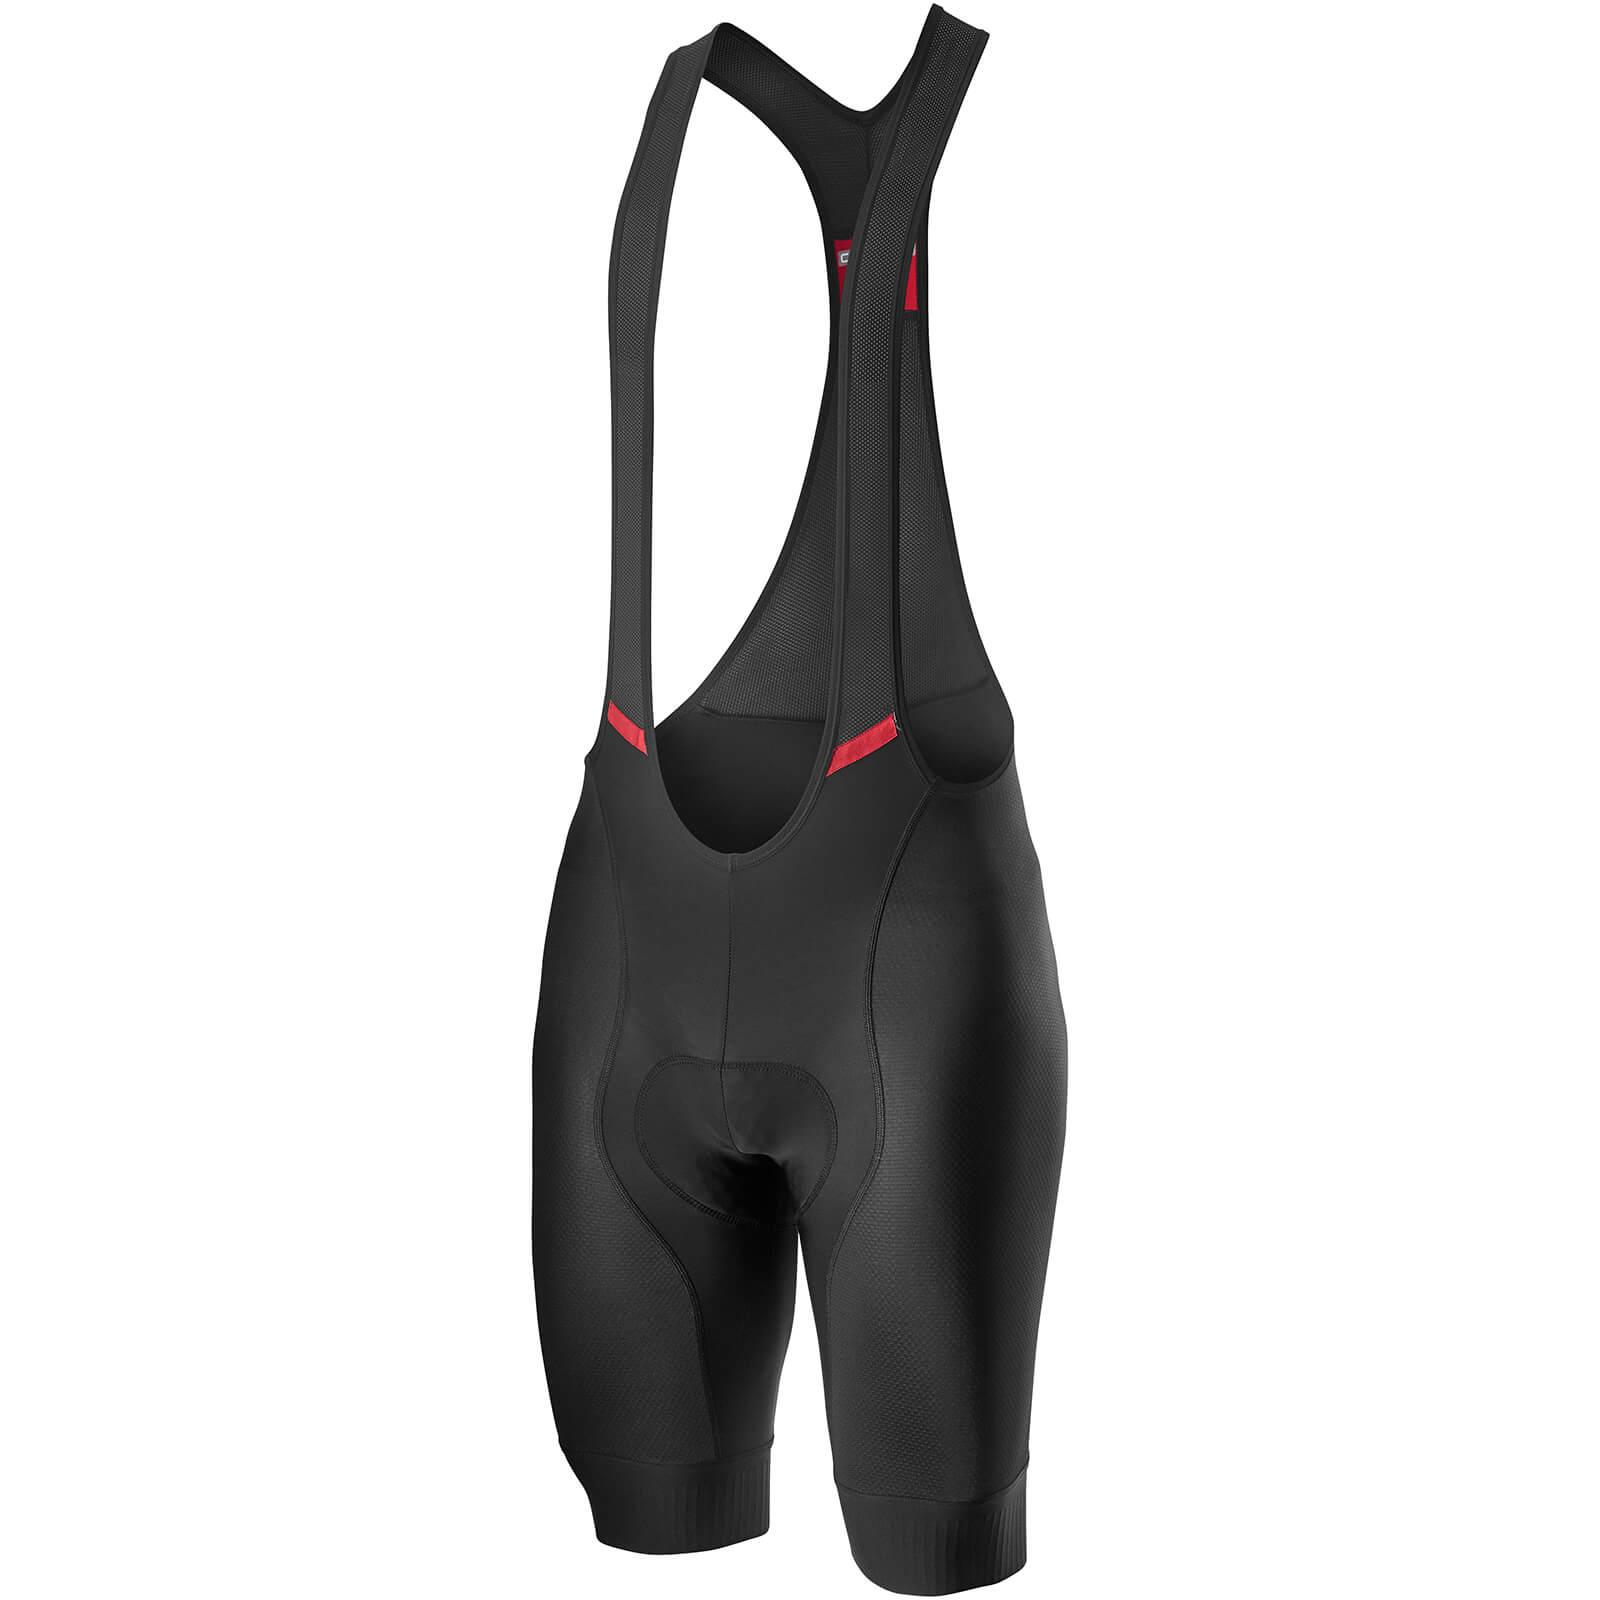 Castelli Competizione Bib Shorts - XL - Black